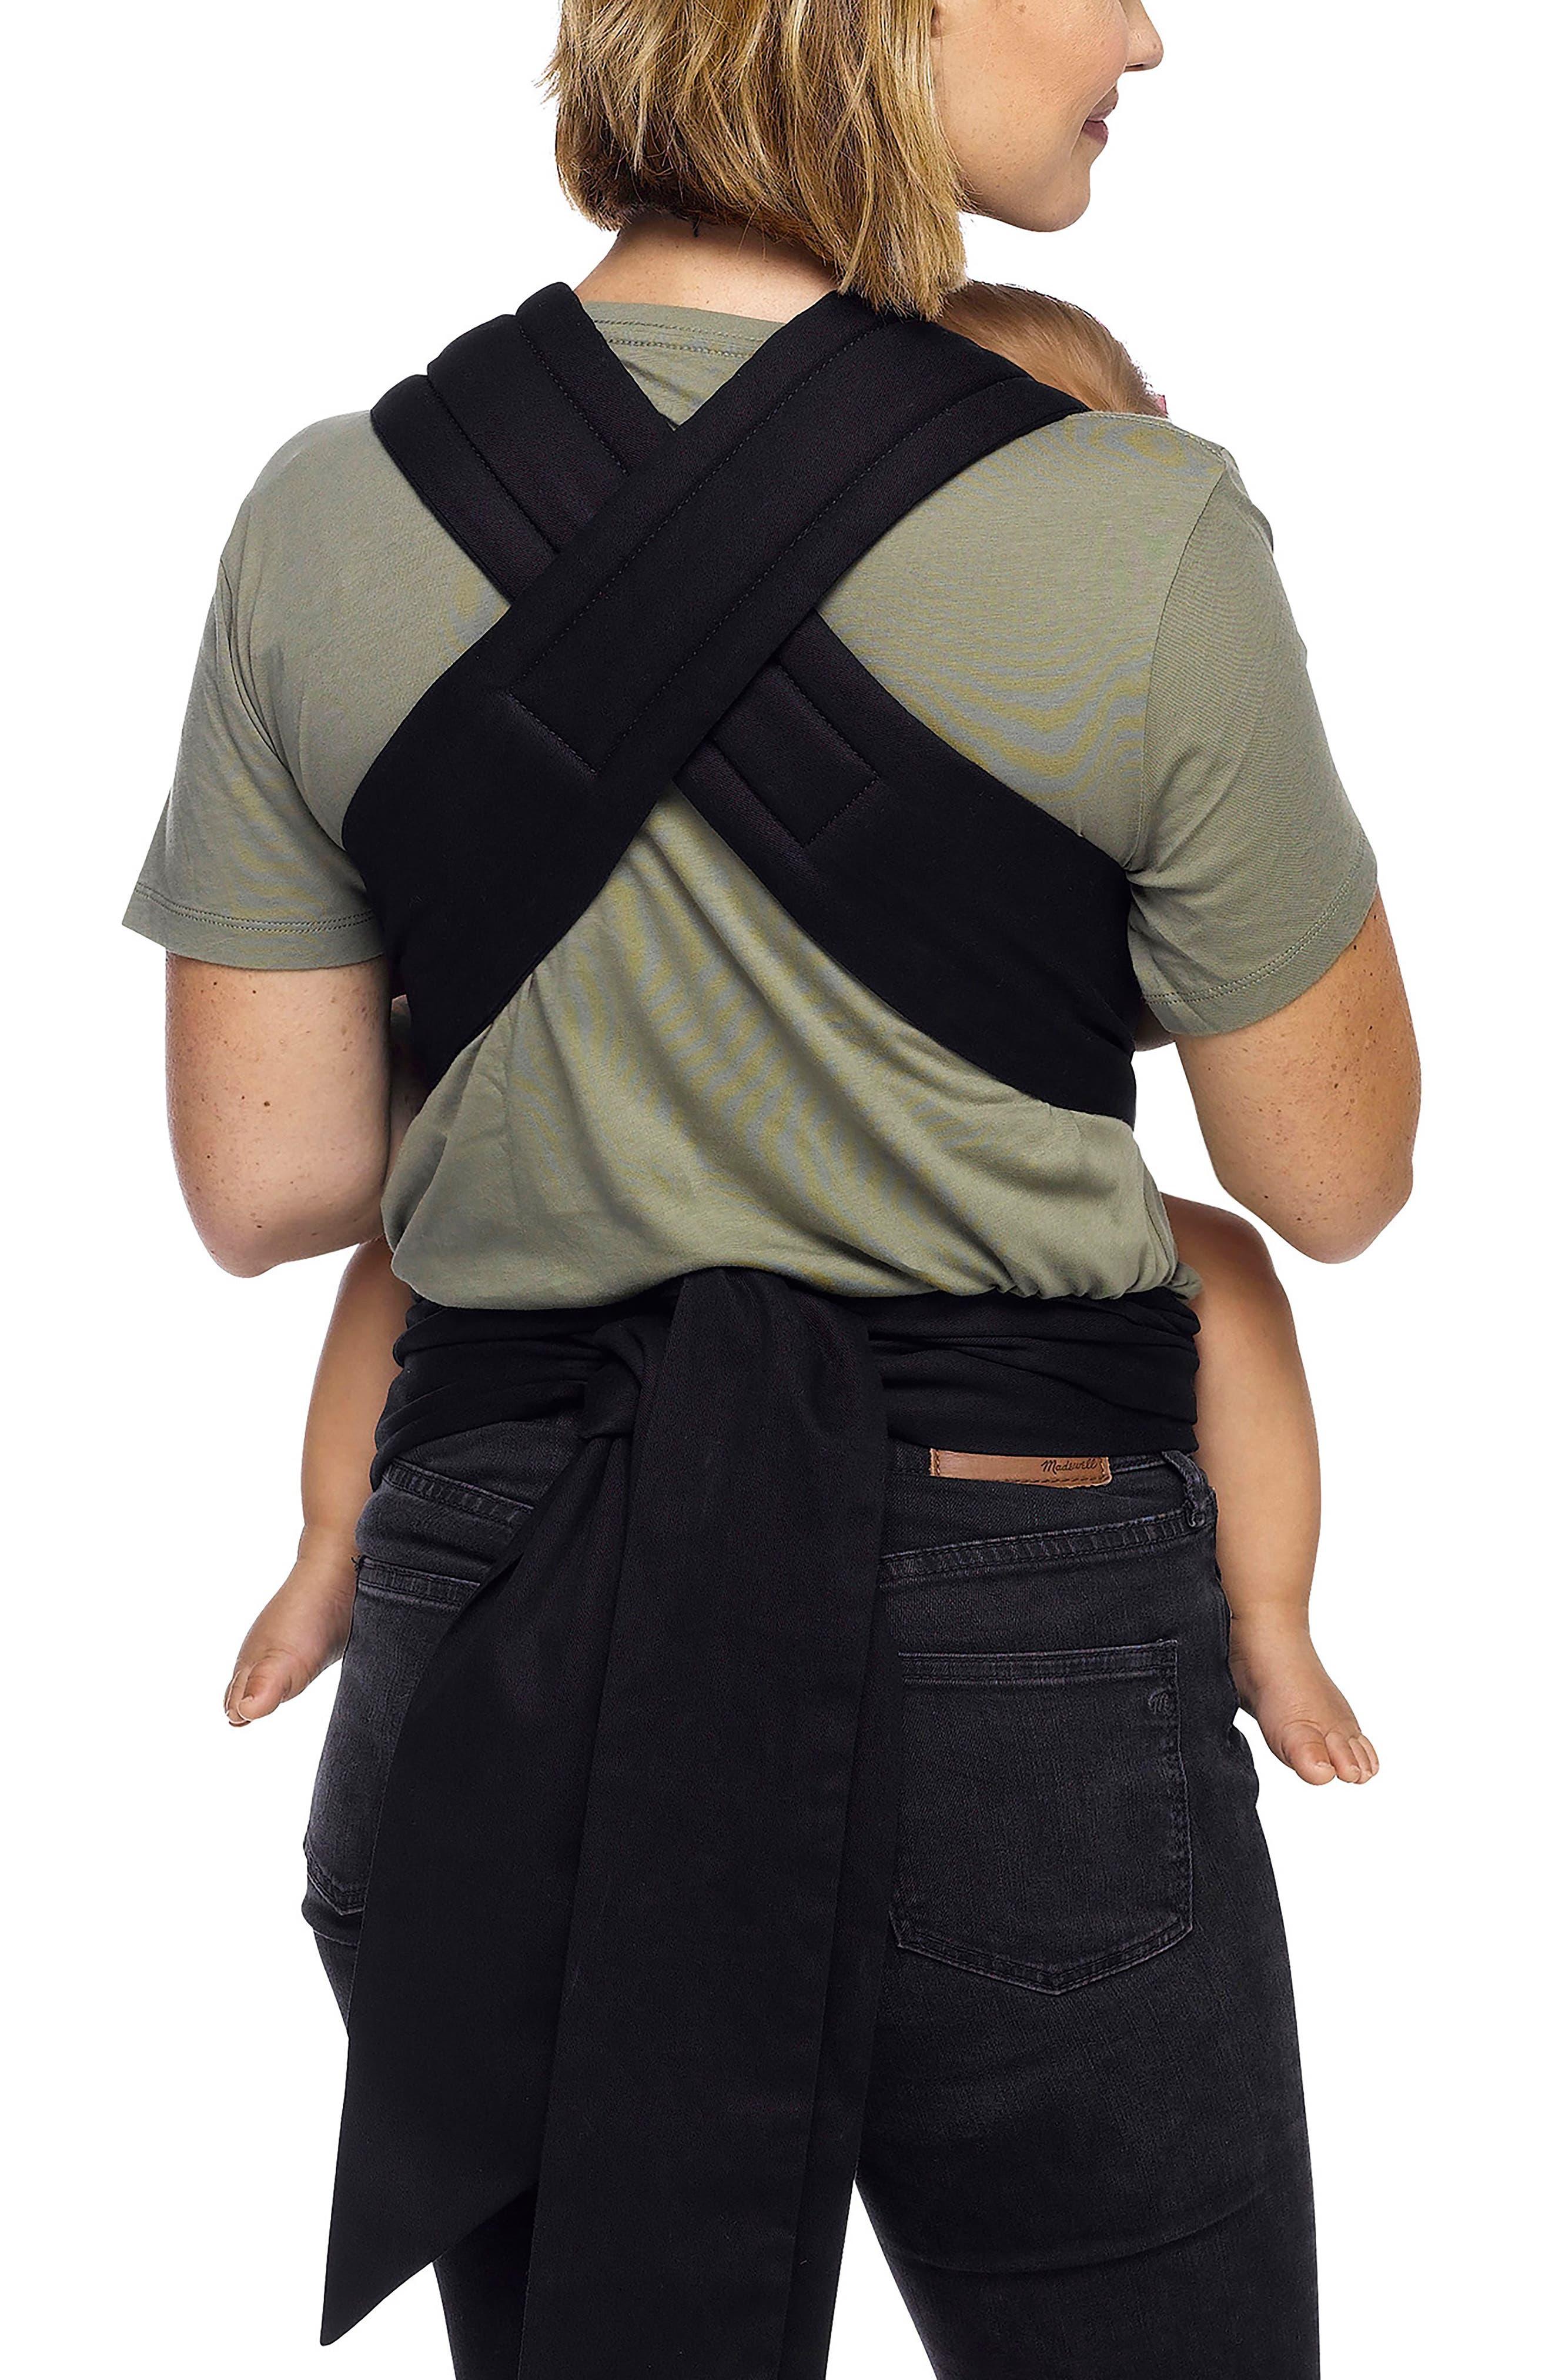 Wrap Double Tie Baby Carrier,                             Alternate thumbnail 3, color,                             001